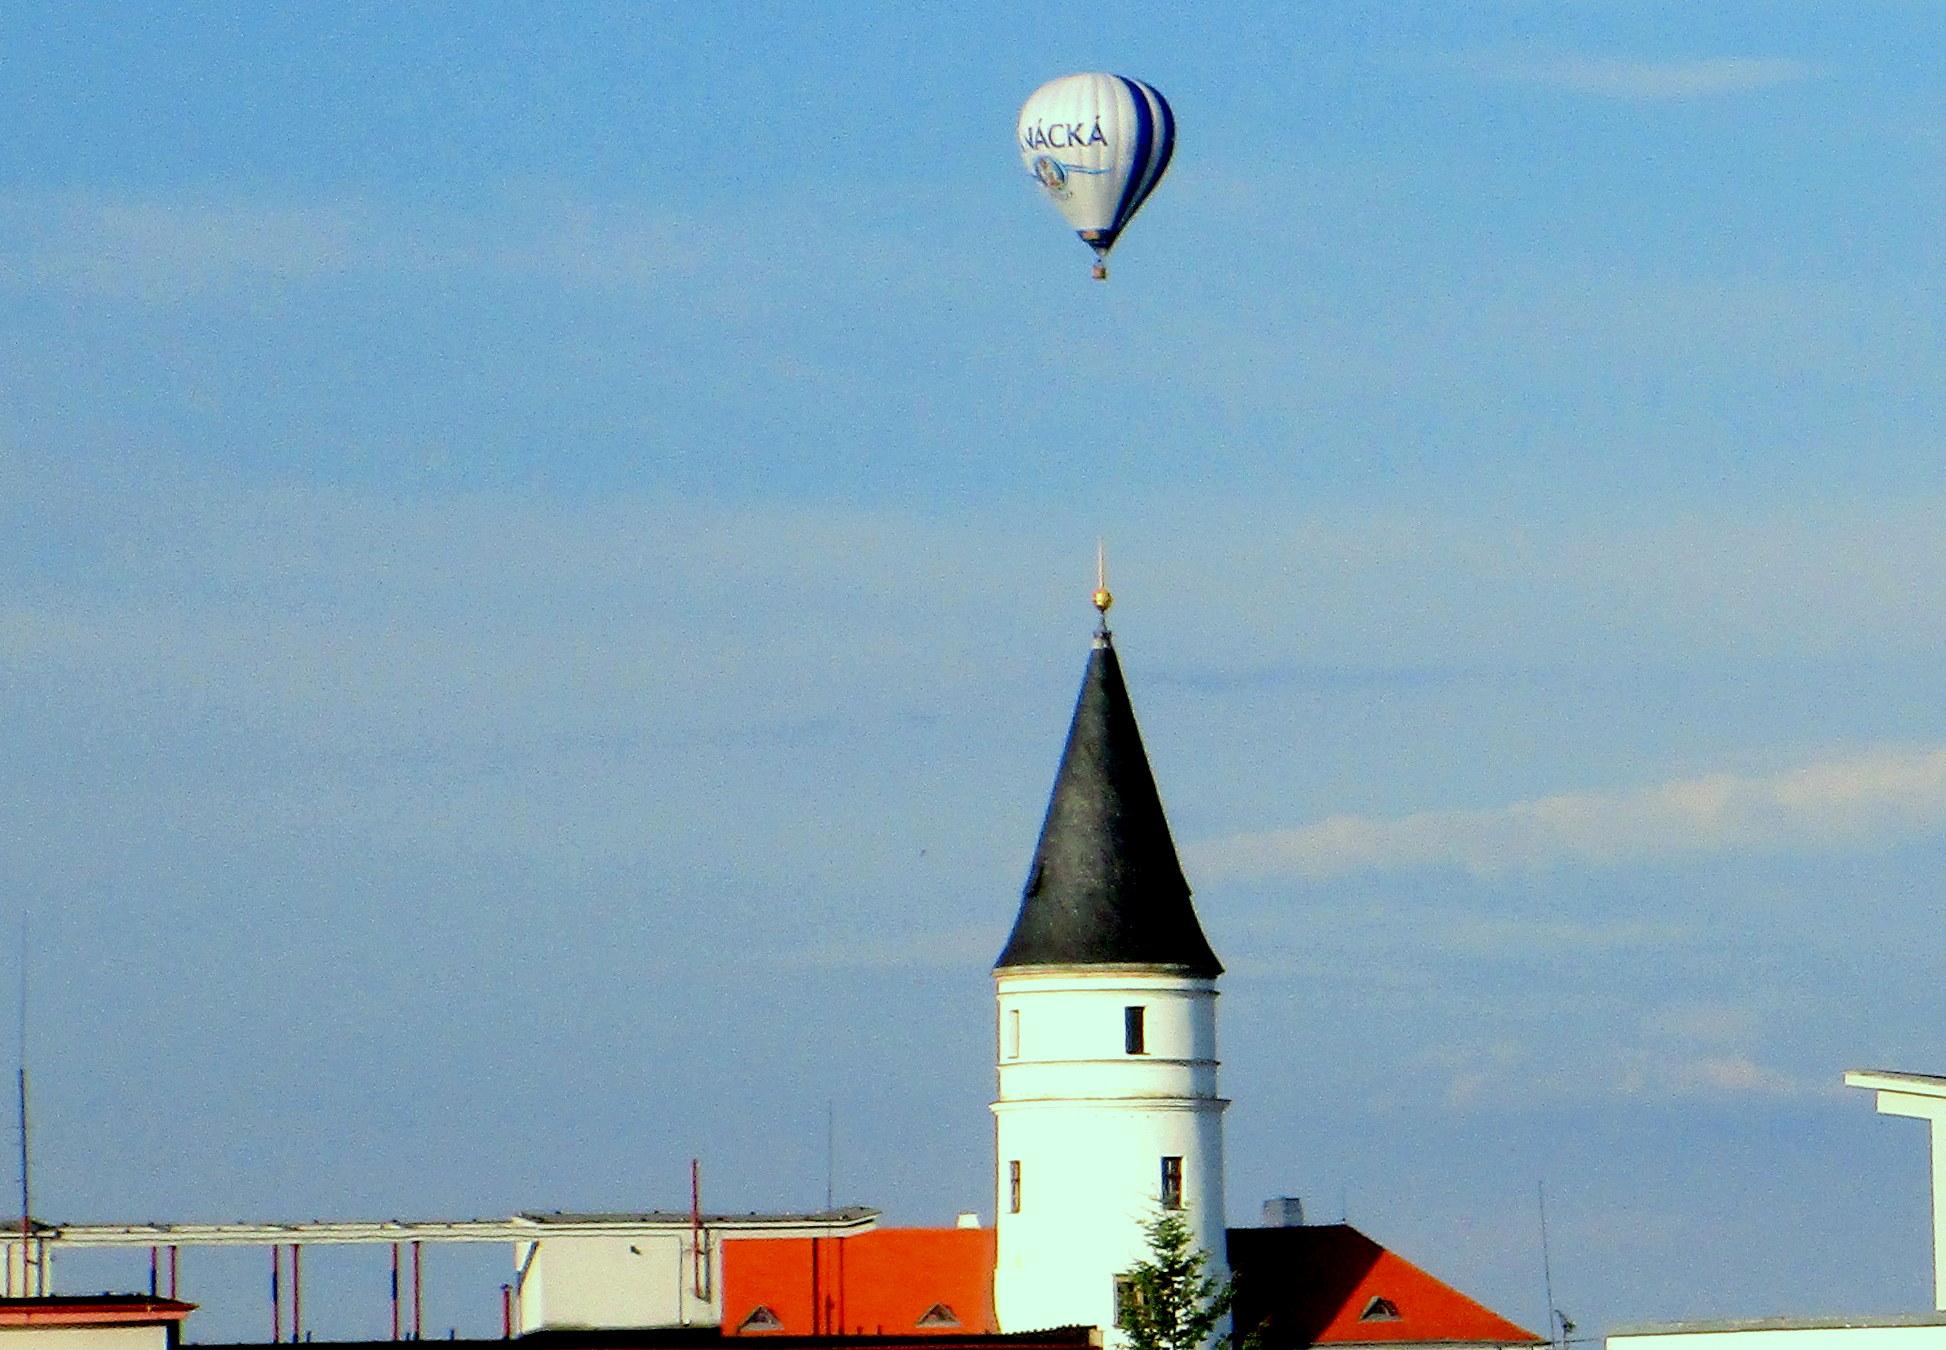 2 Přesné oko pilota balónu